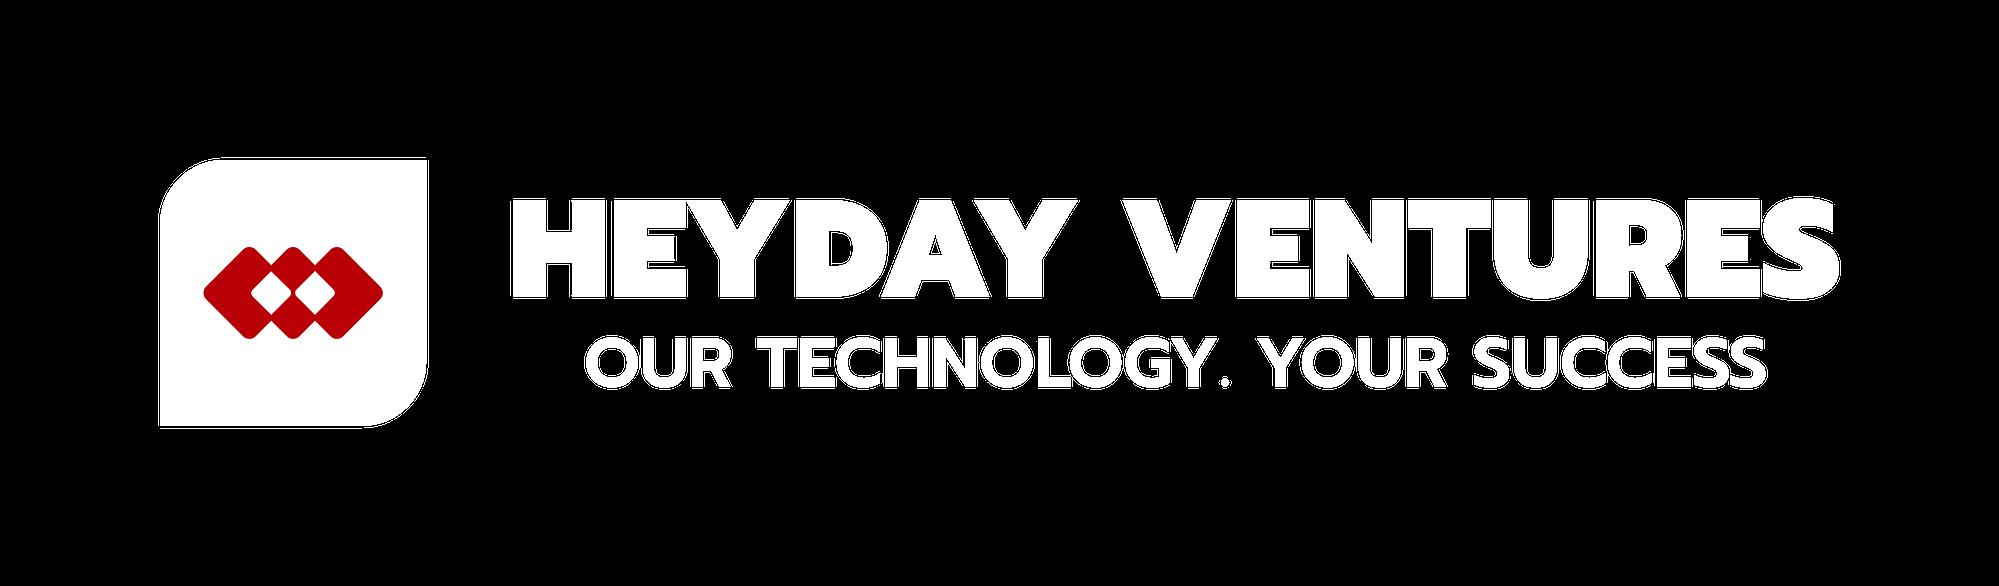 Heyday Ventures Logo White